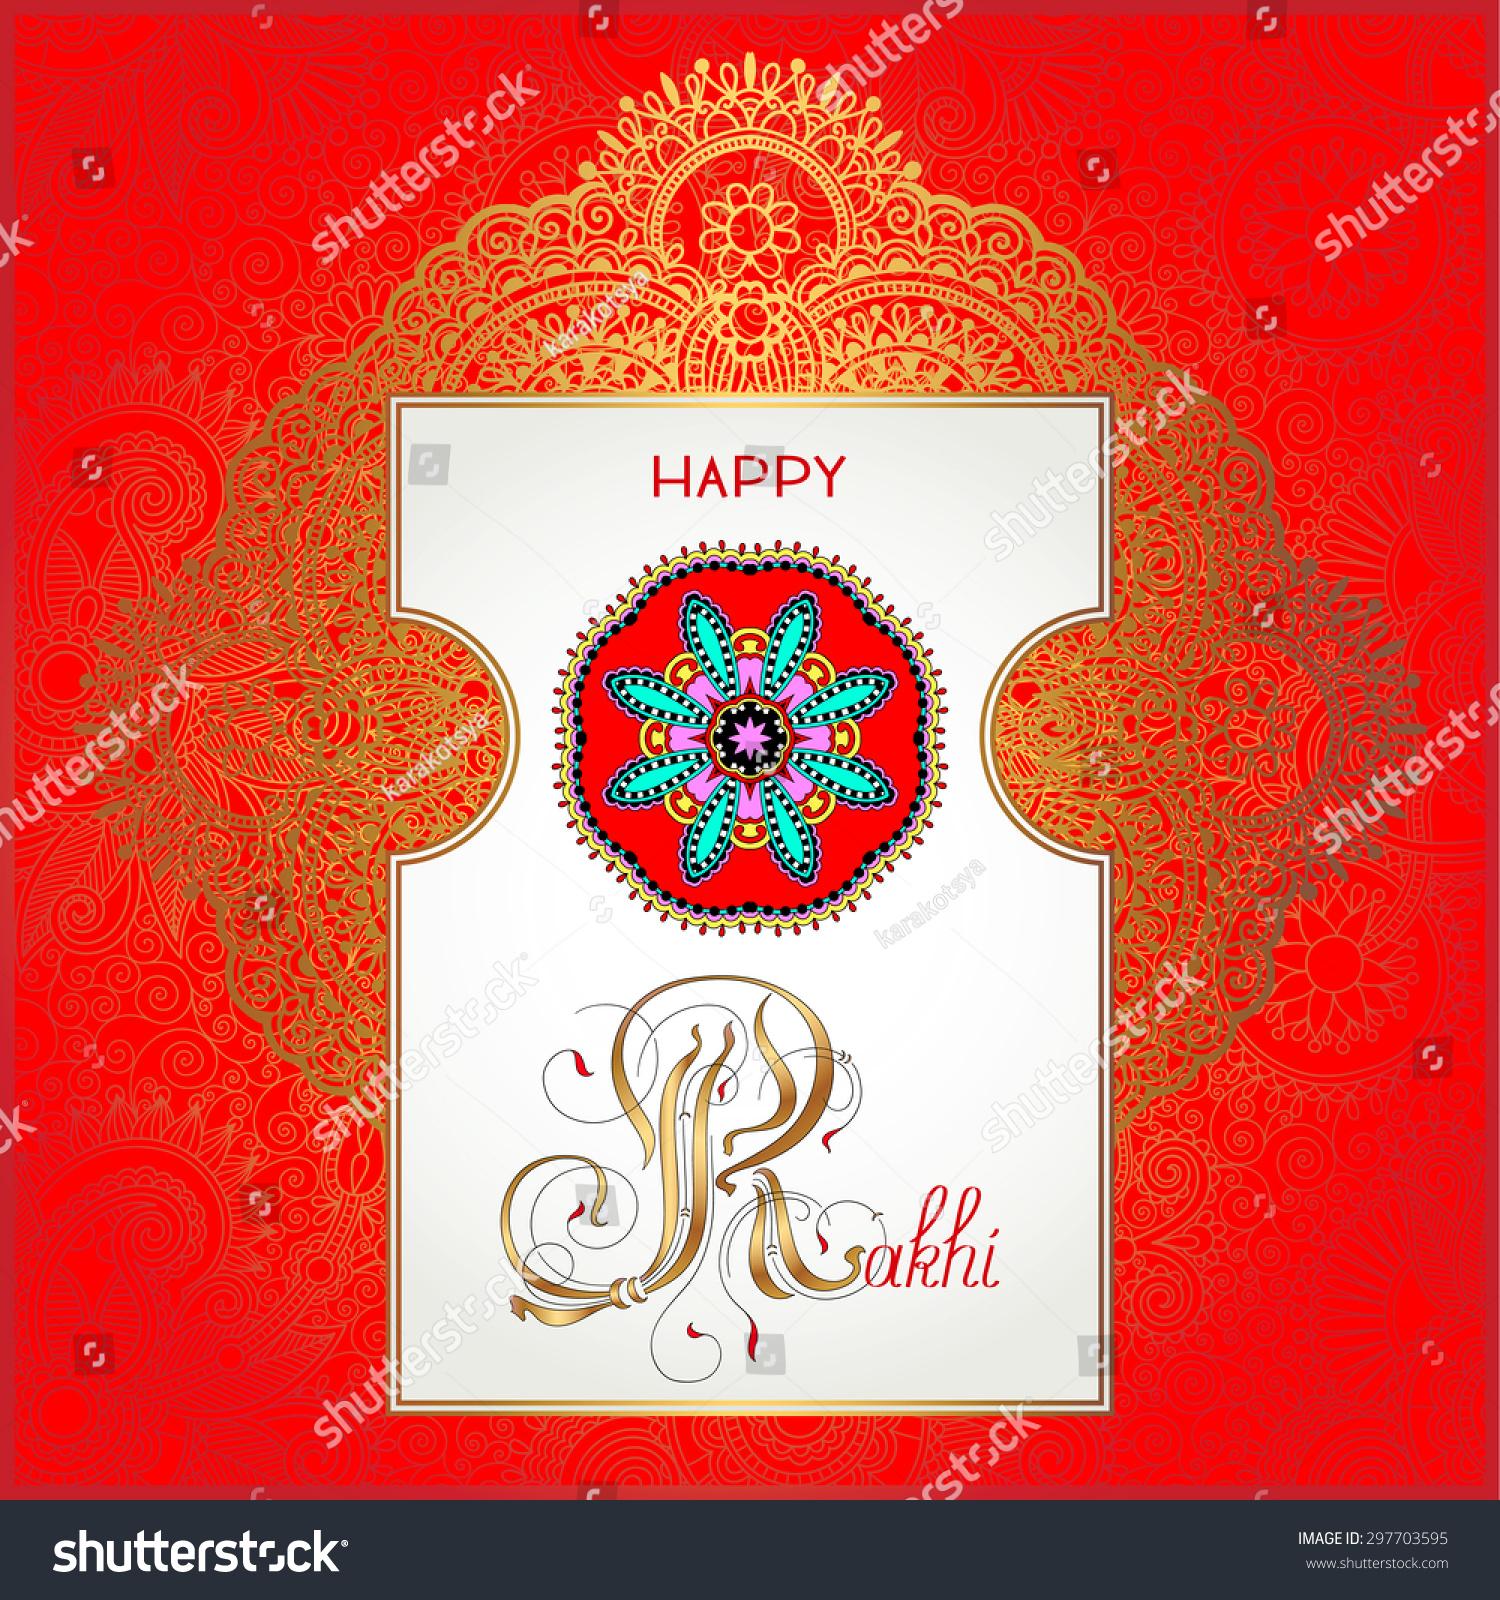 Red happy rakhi greeting card indian stock vector 297703595 red happy rakhi greeting card for indian holiday raksha bandhan with original ornamental bangle on floral kristyandbryce Choice Image